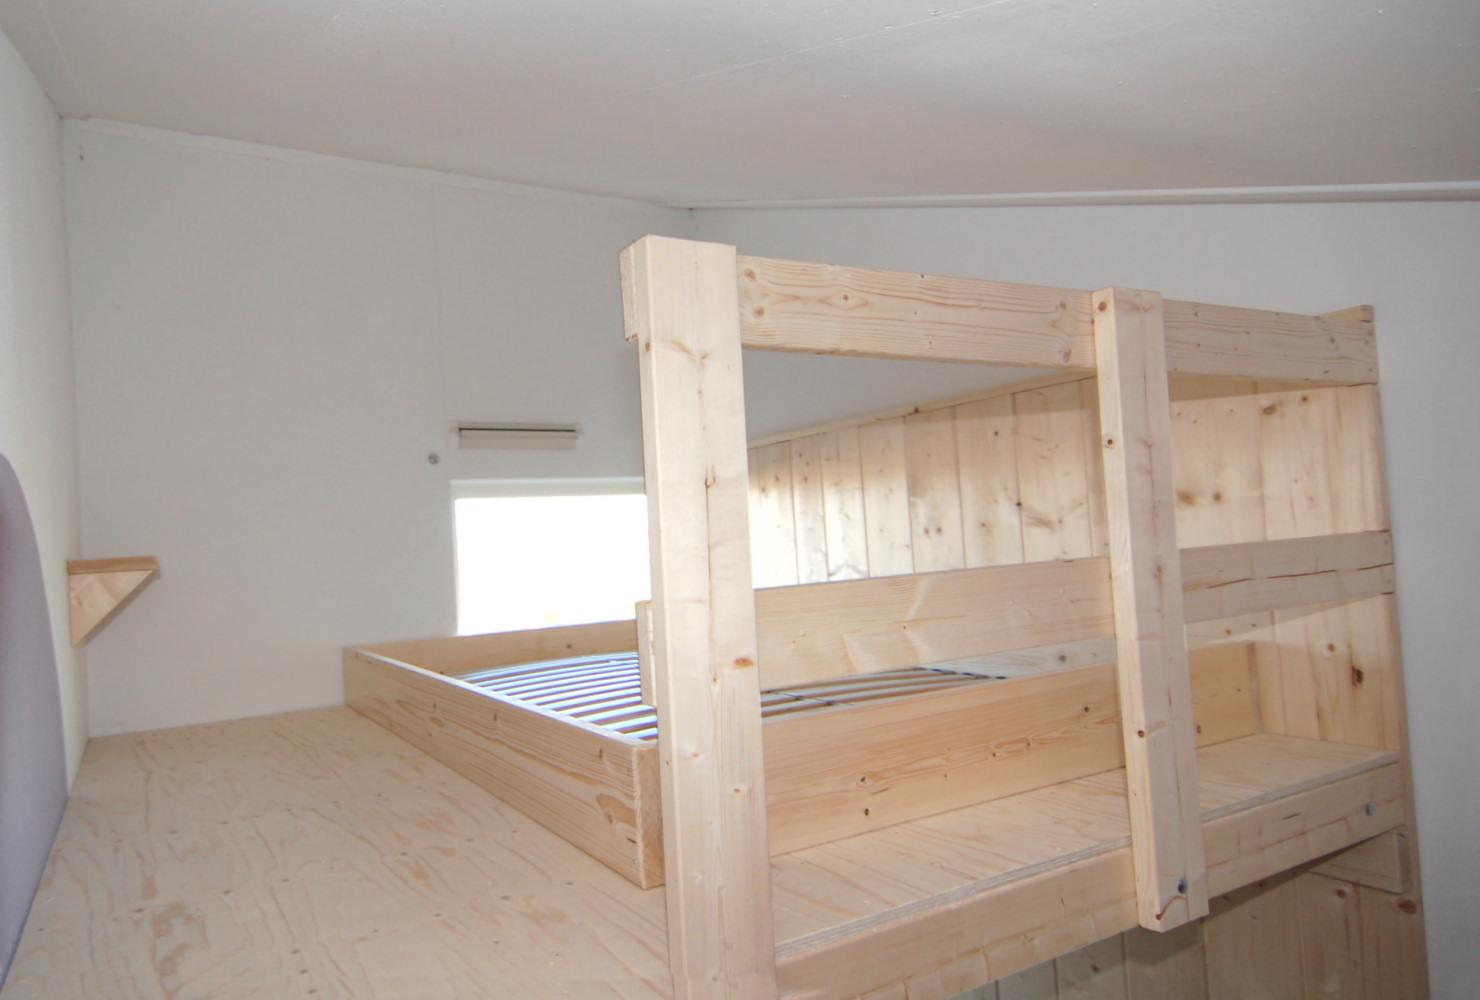 Hoogslaper Met Kast Eronder : Hoog slapen in een kinderkamer met videbed mura mura